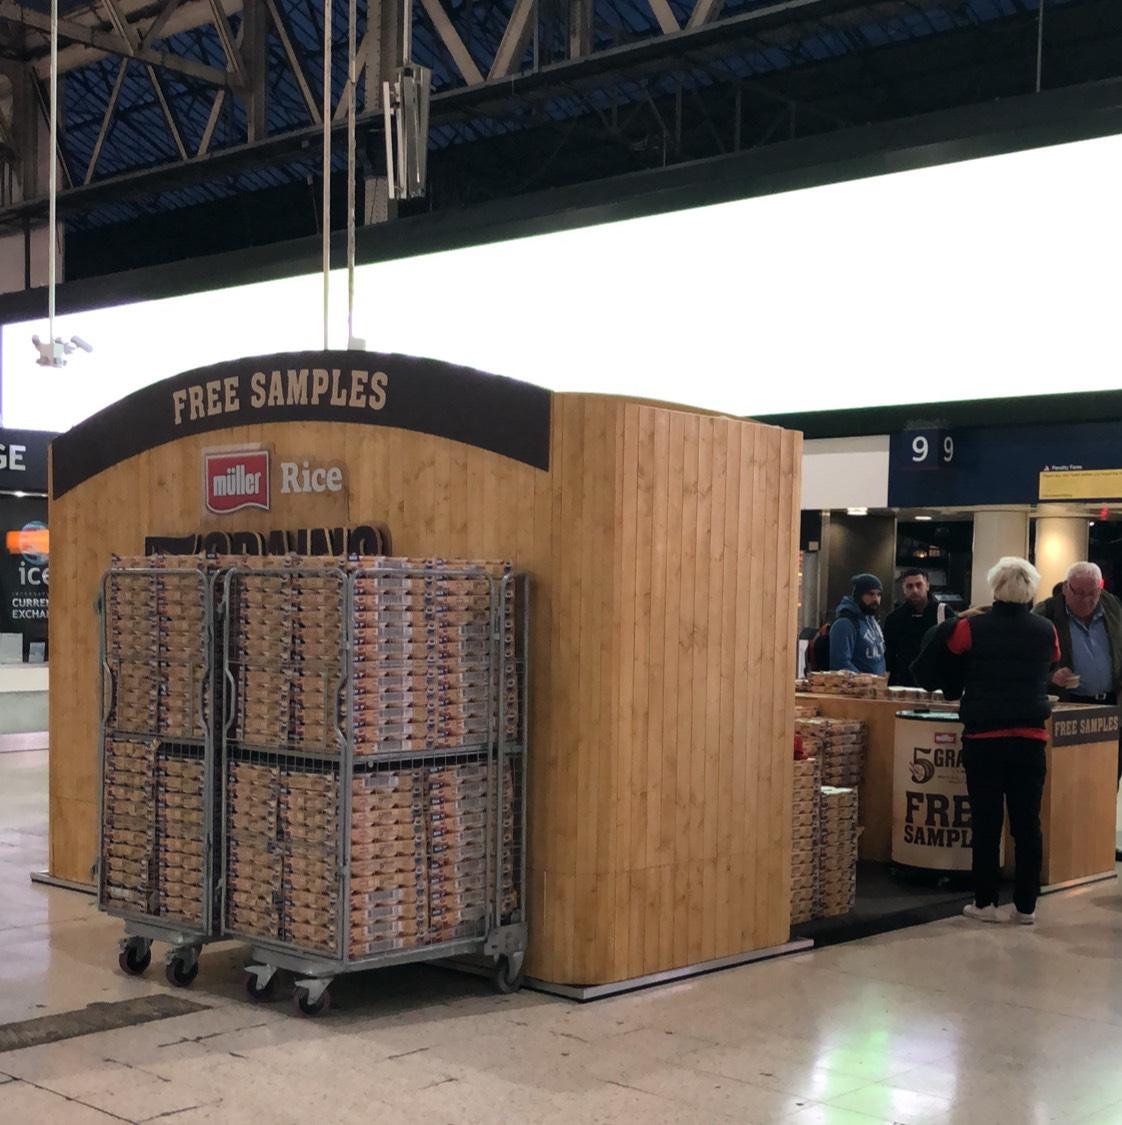 Free samples of Muller rice at Waterloo station